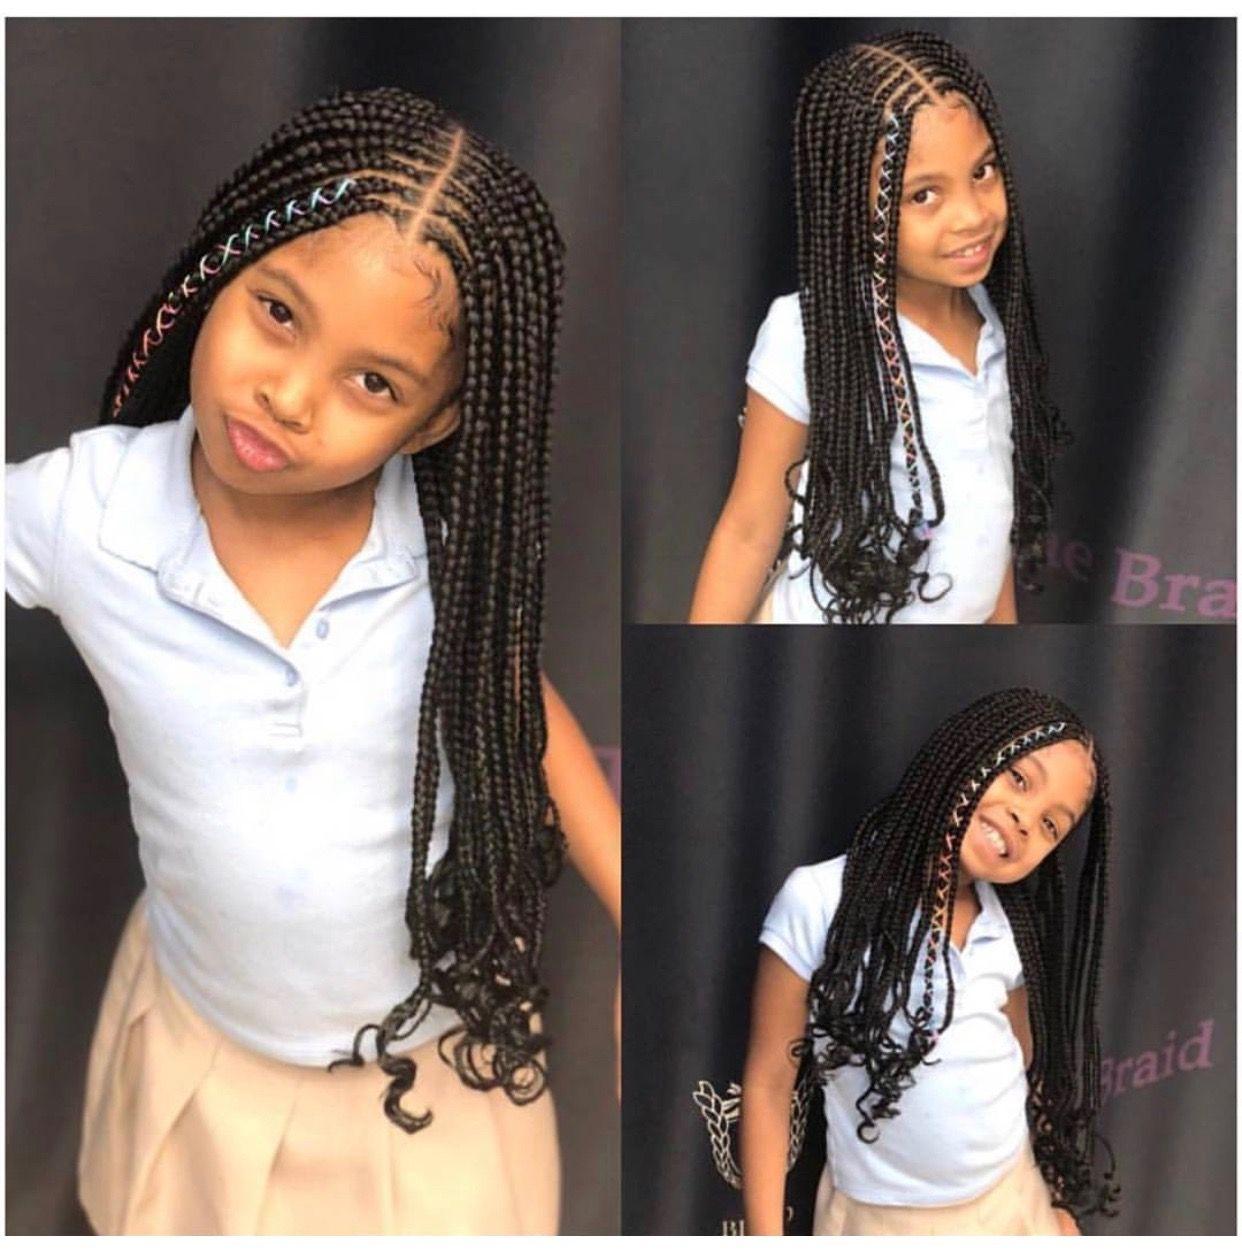 Kid S Braids Black Kids Hairstyles Braid Styles For Girls Kid